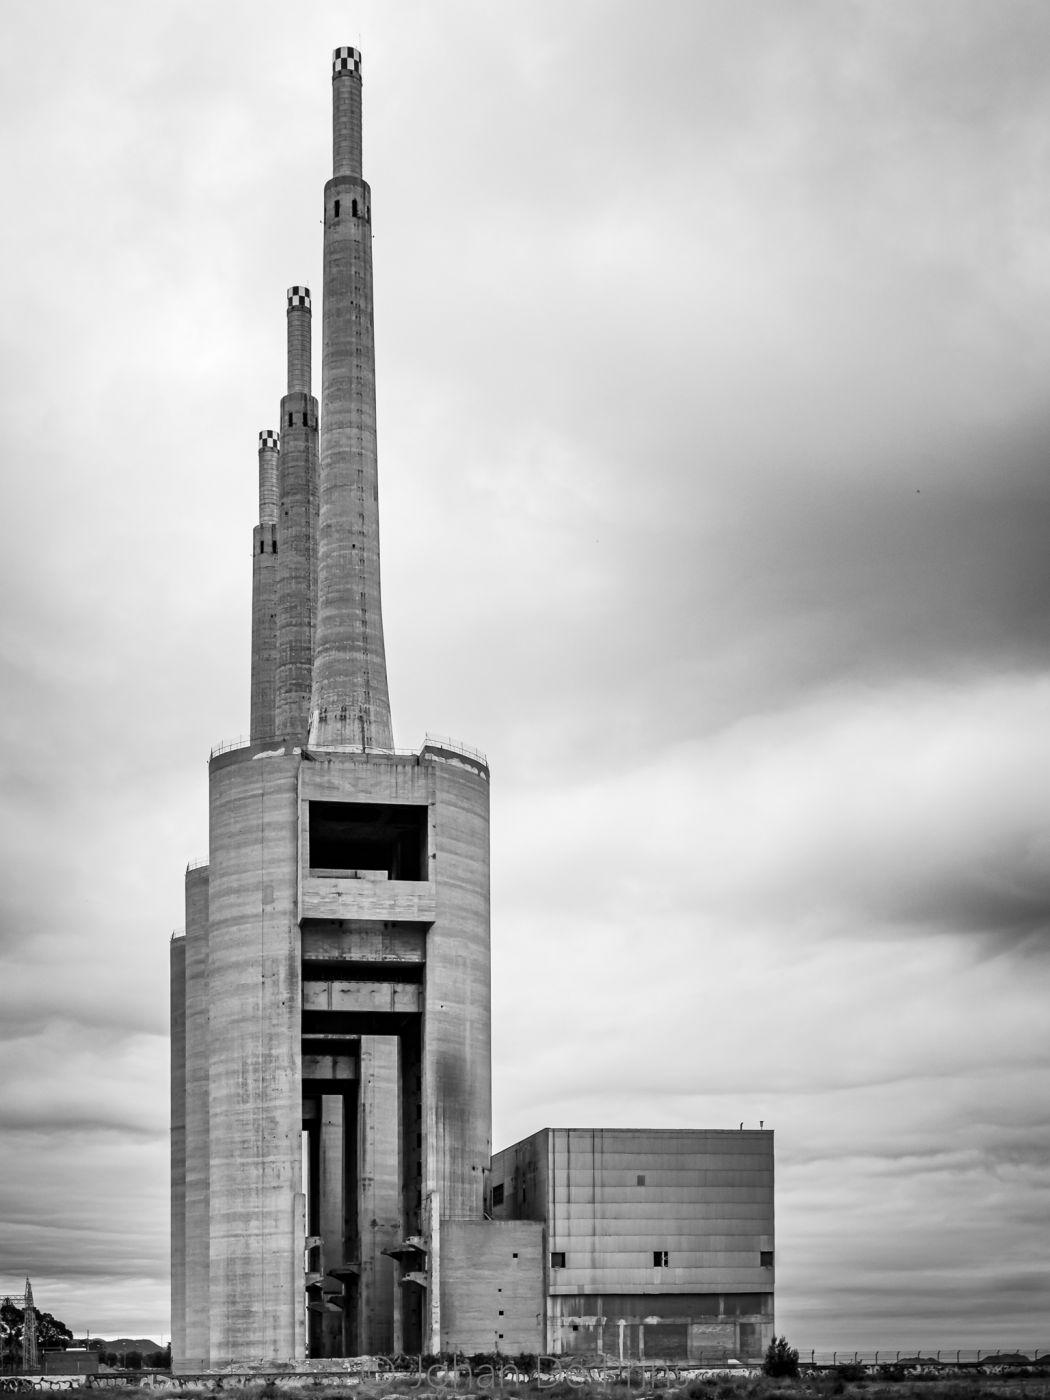 Badalona Power Plant, Spain